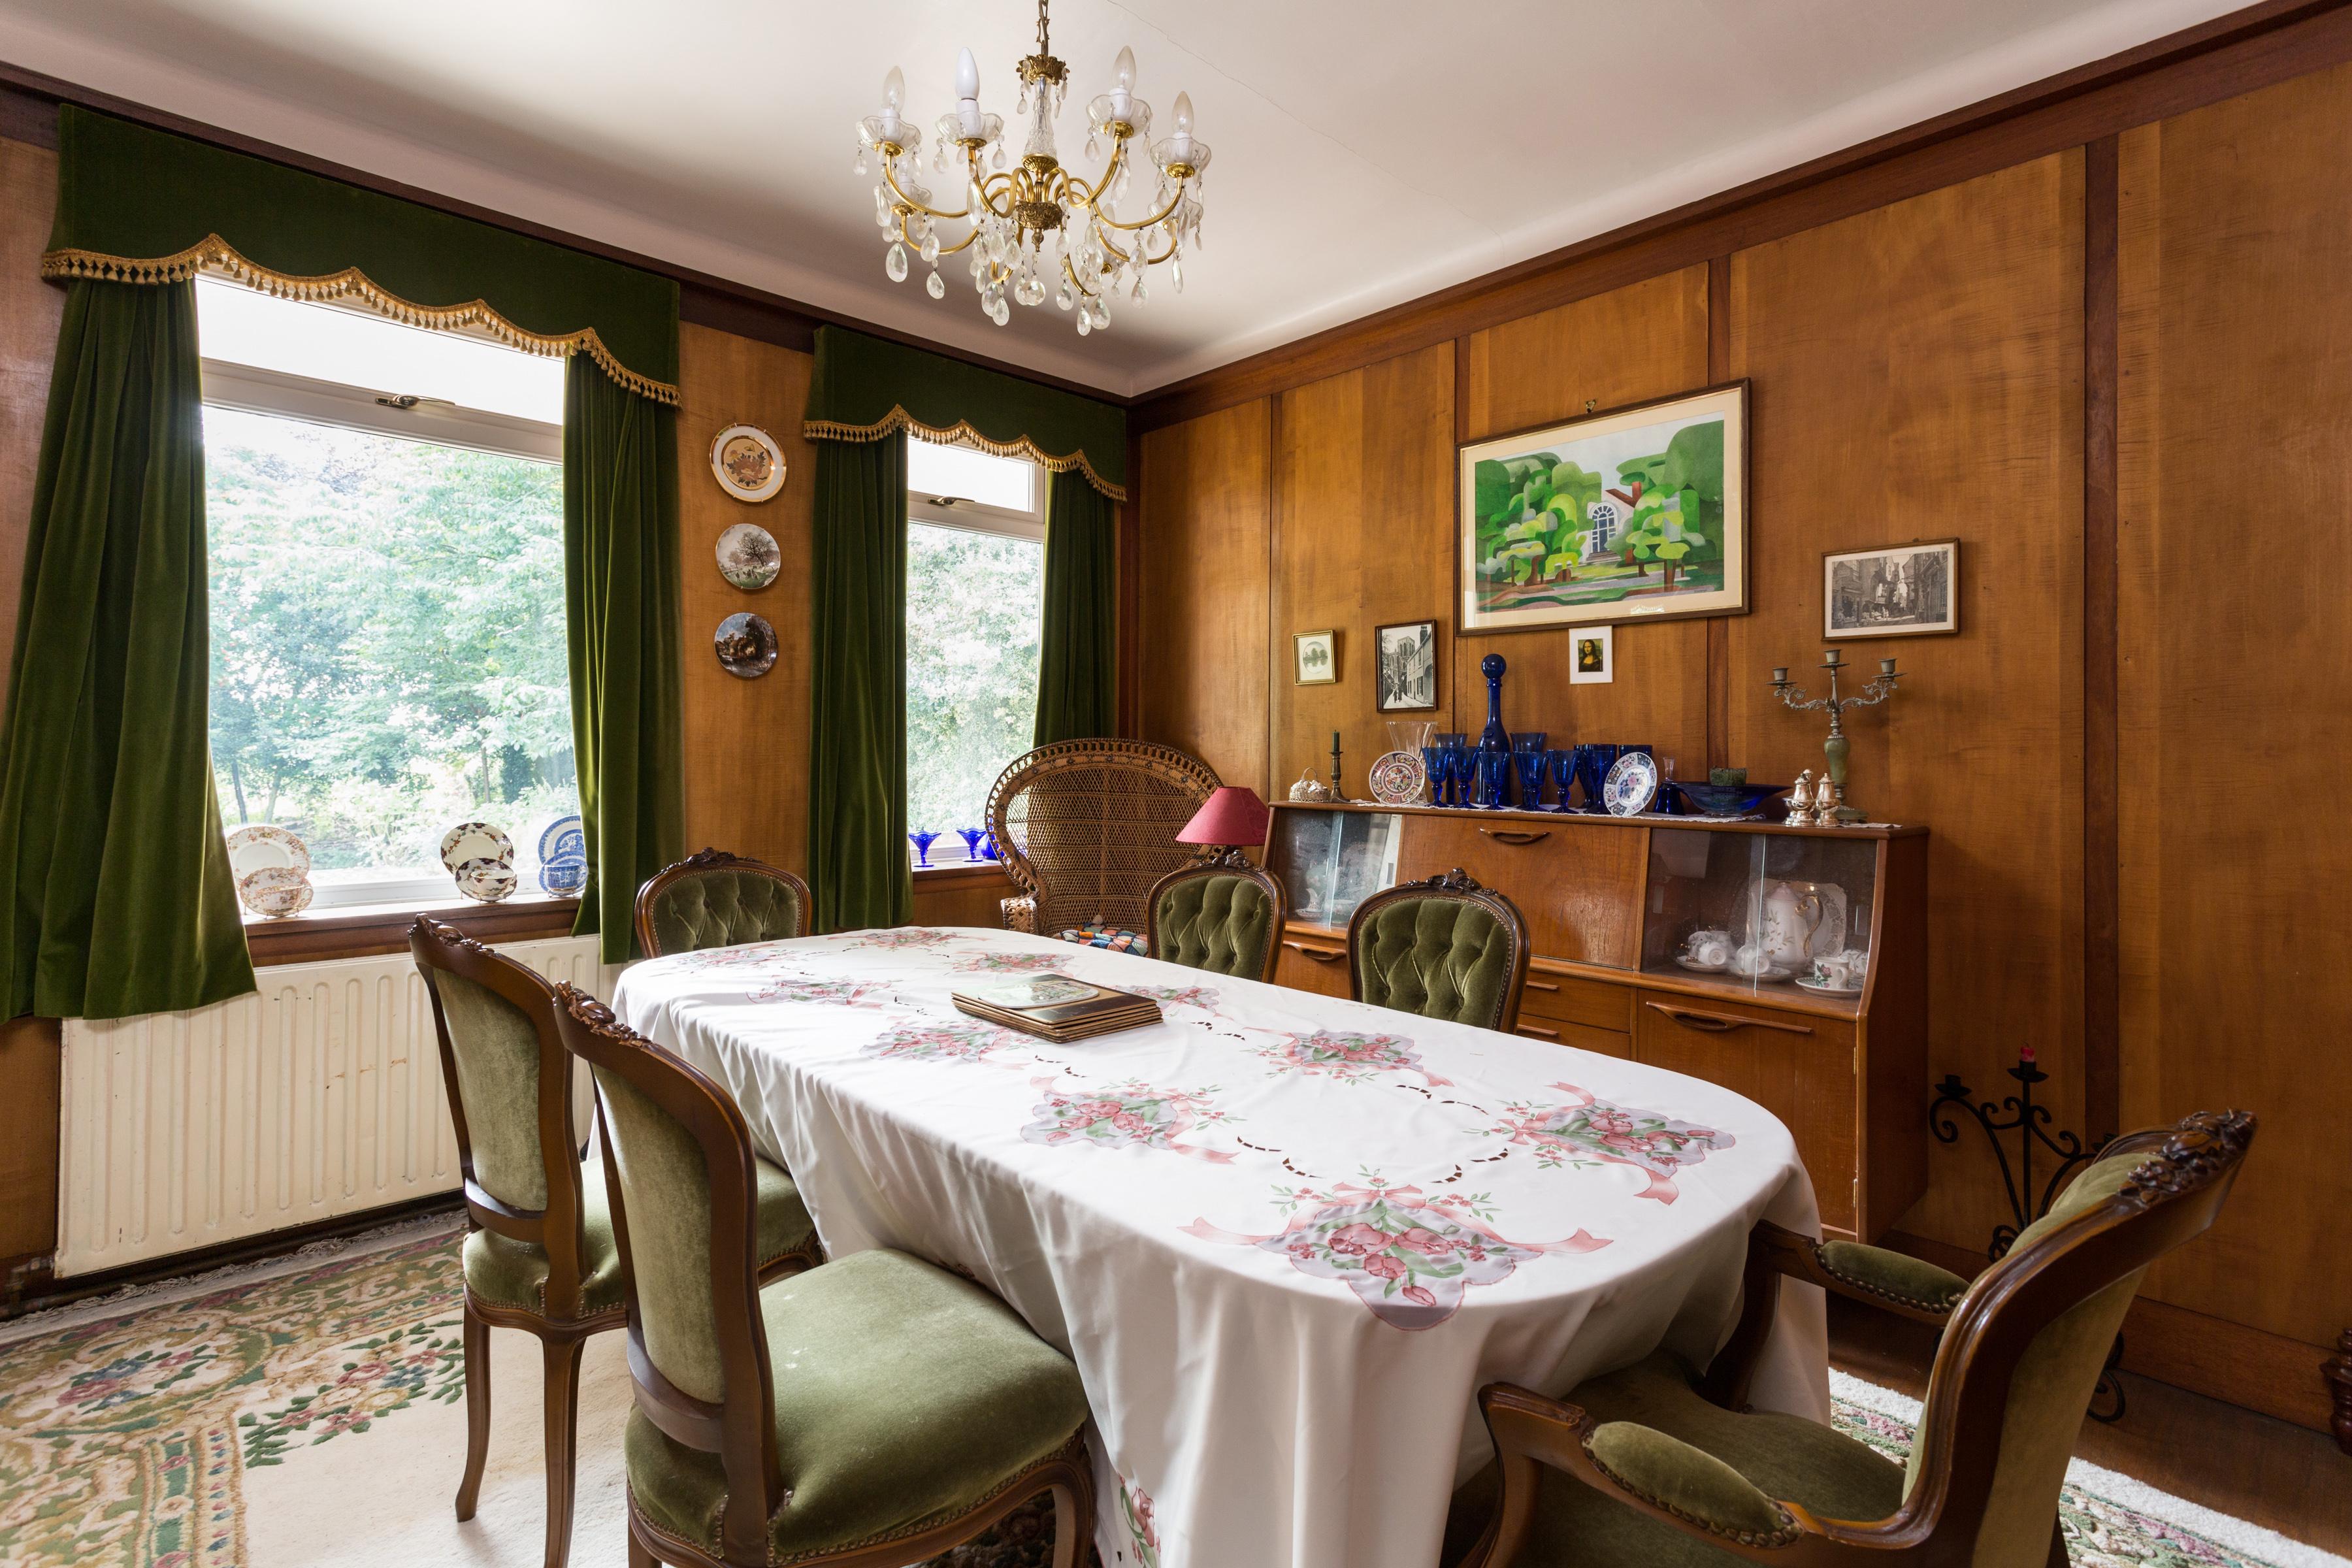 53 Hillfield House, Askham Lane, York - property for sale in York